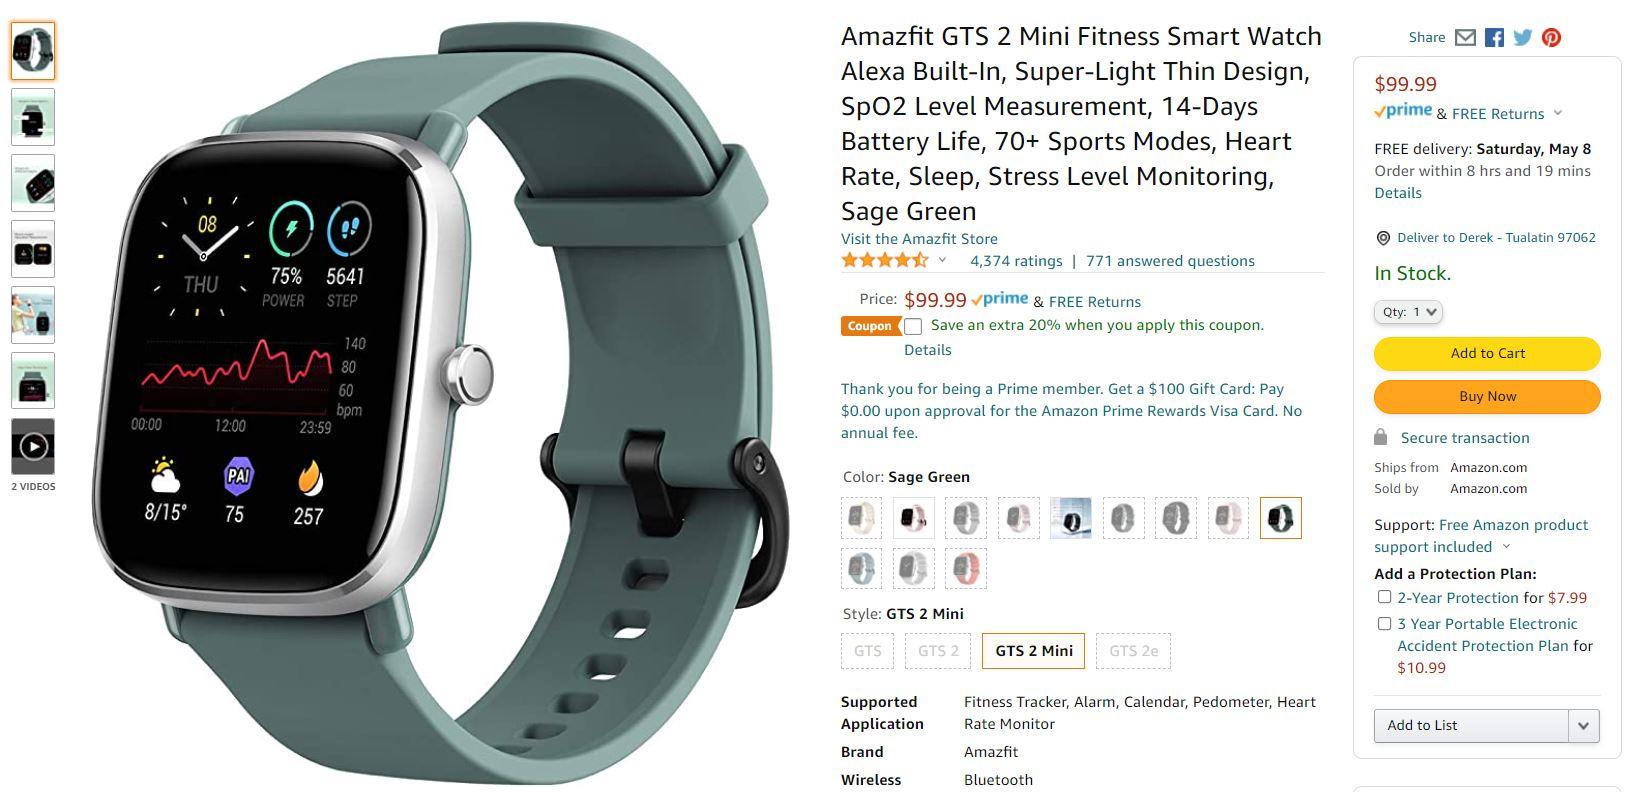 Amazfit GTS 2 Mini Fitness Smartwatch Amazon Deal